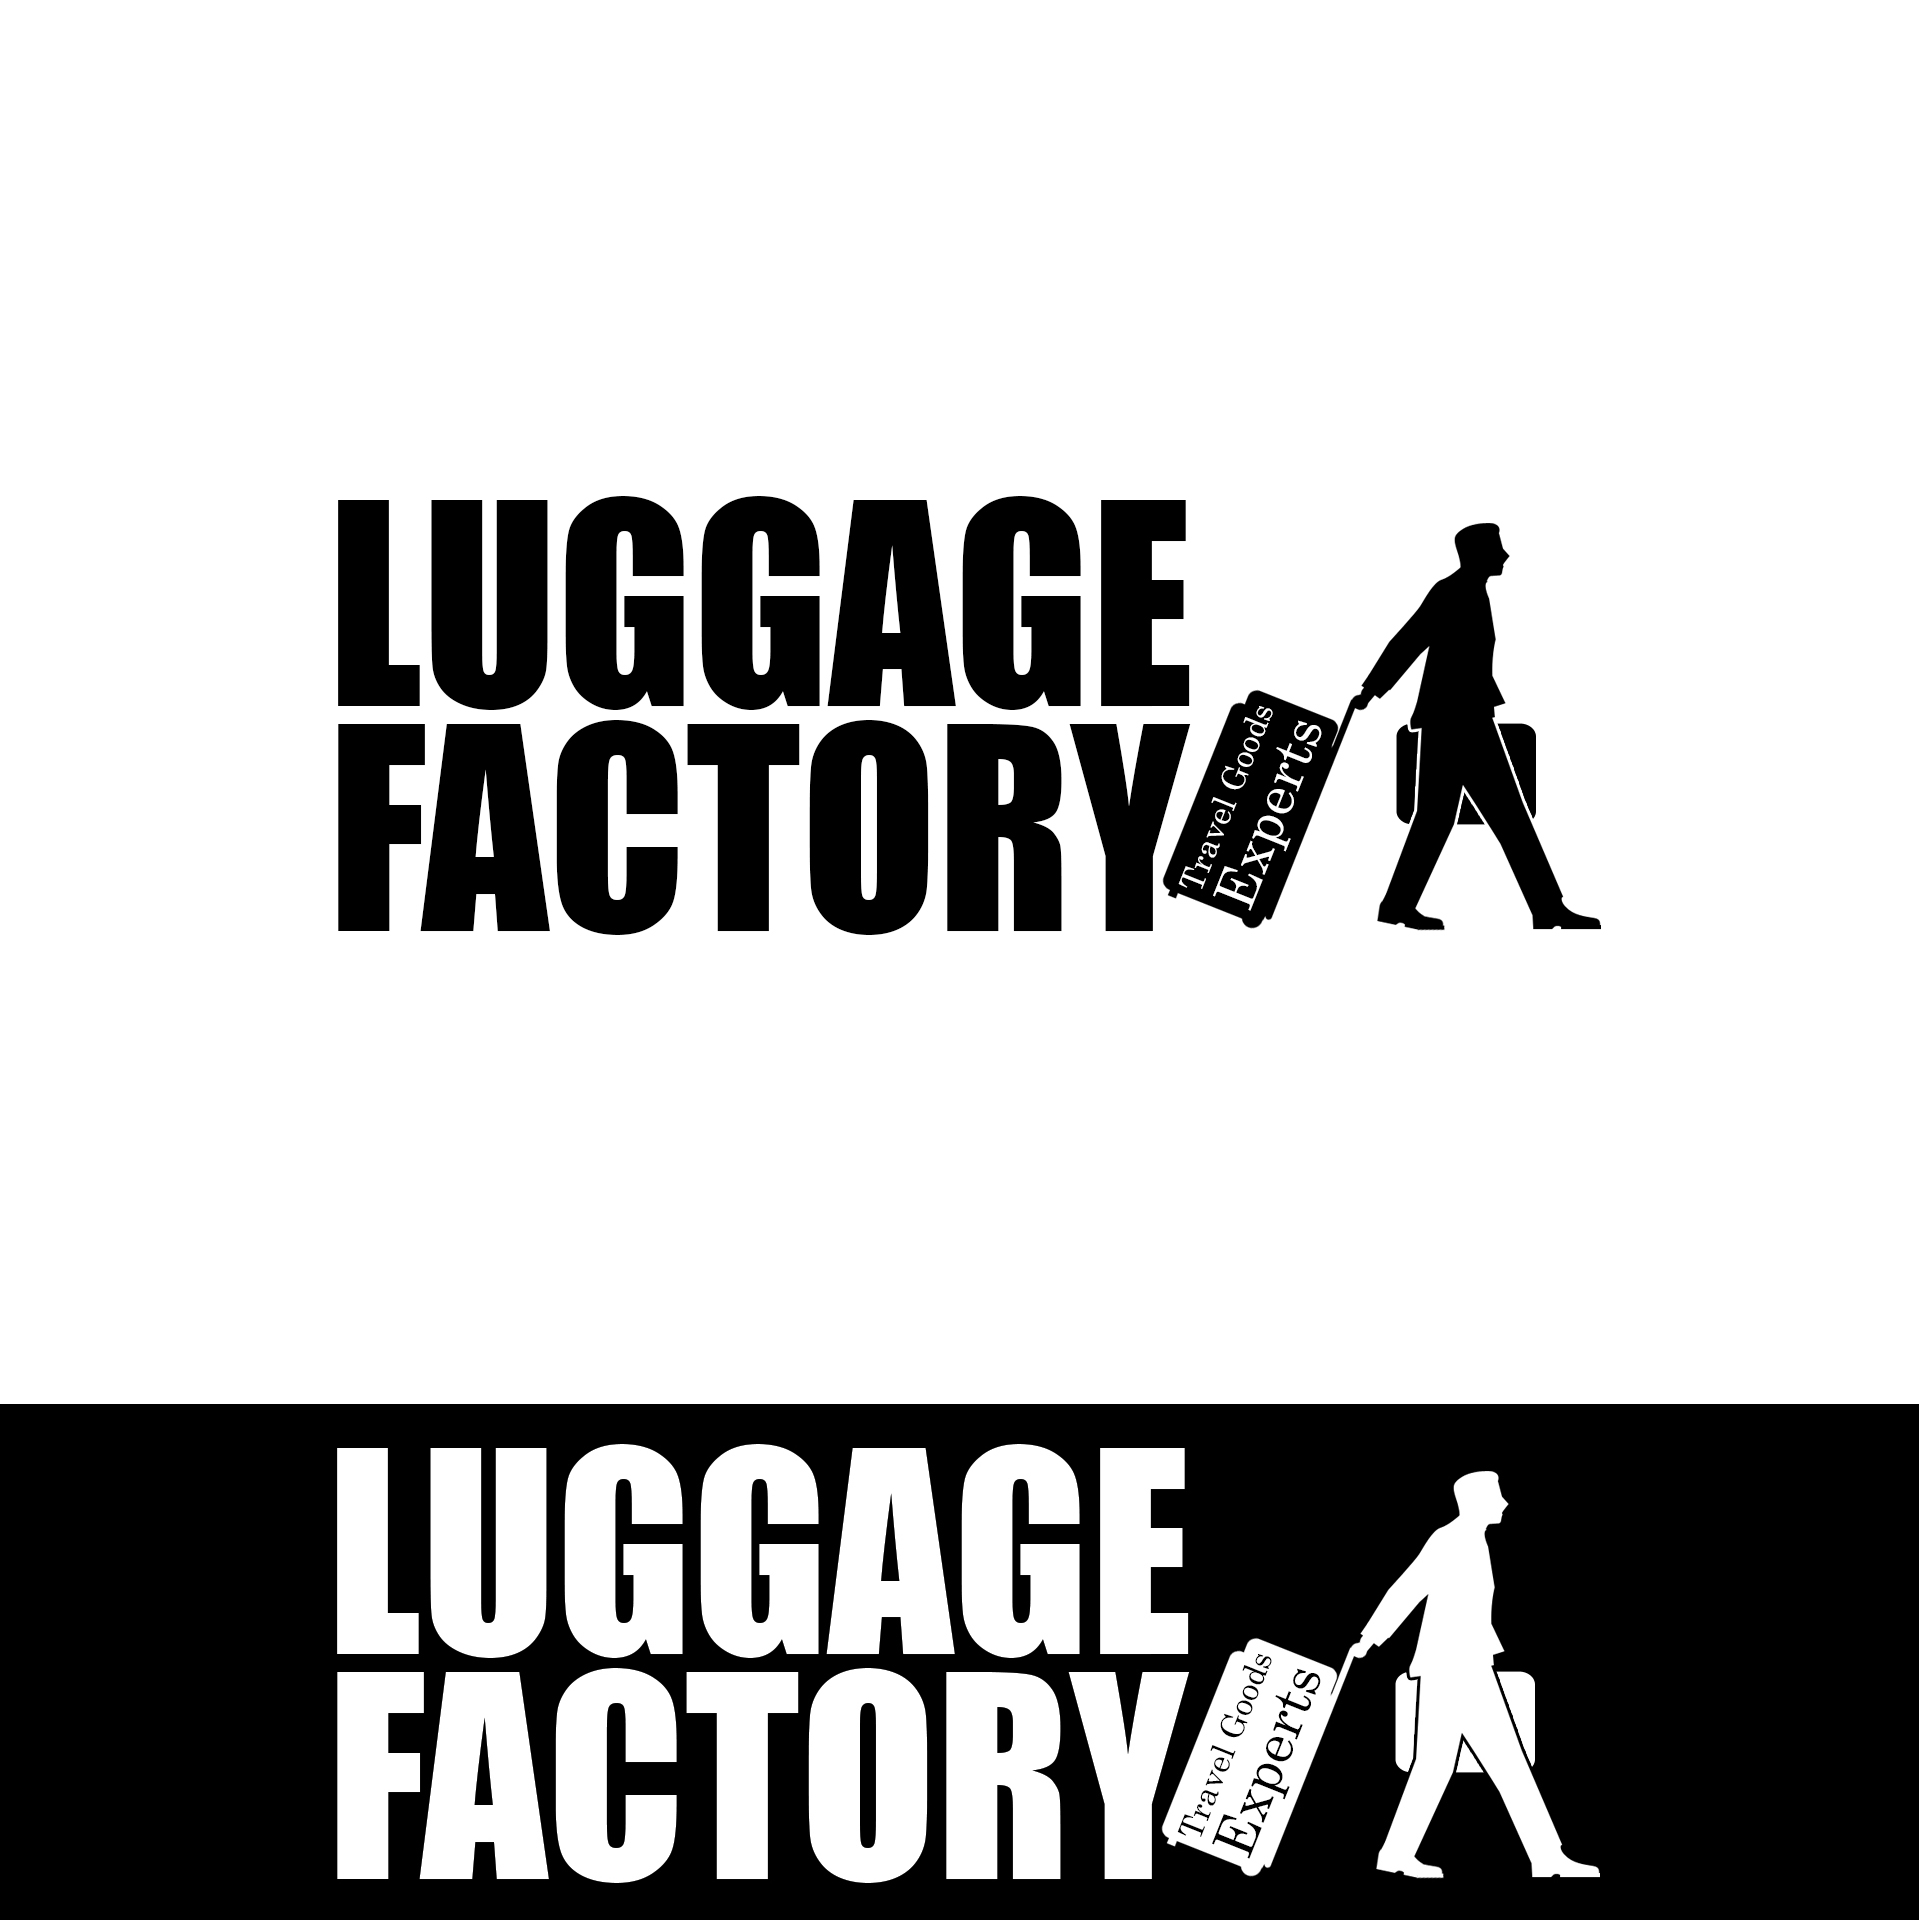 Logo Design by chAnDOS - Entry No. 61 in the Logo Design Contest Creative Logo Design for Luggage Factory.